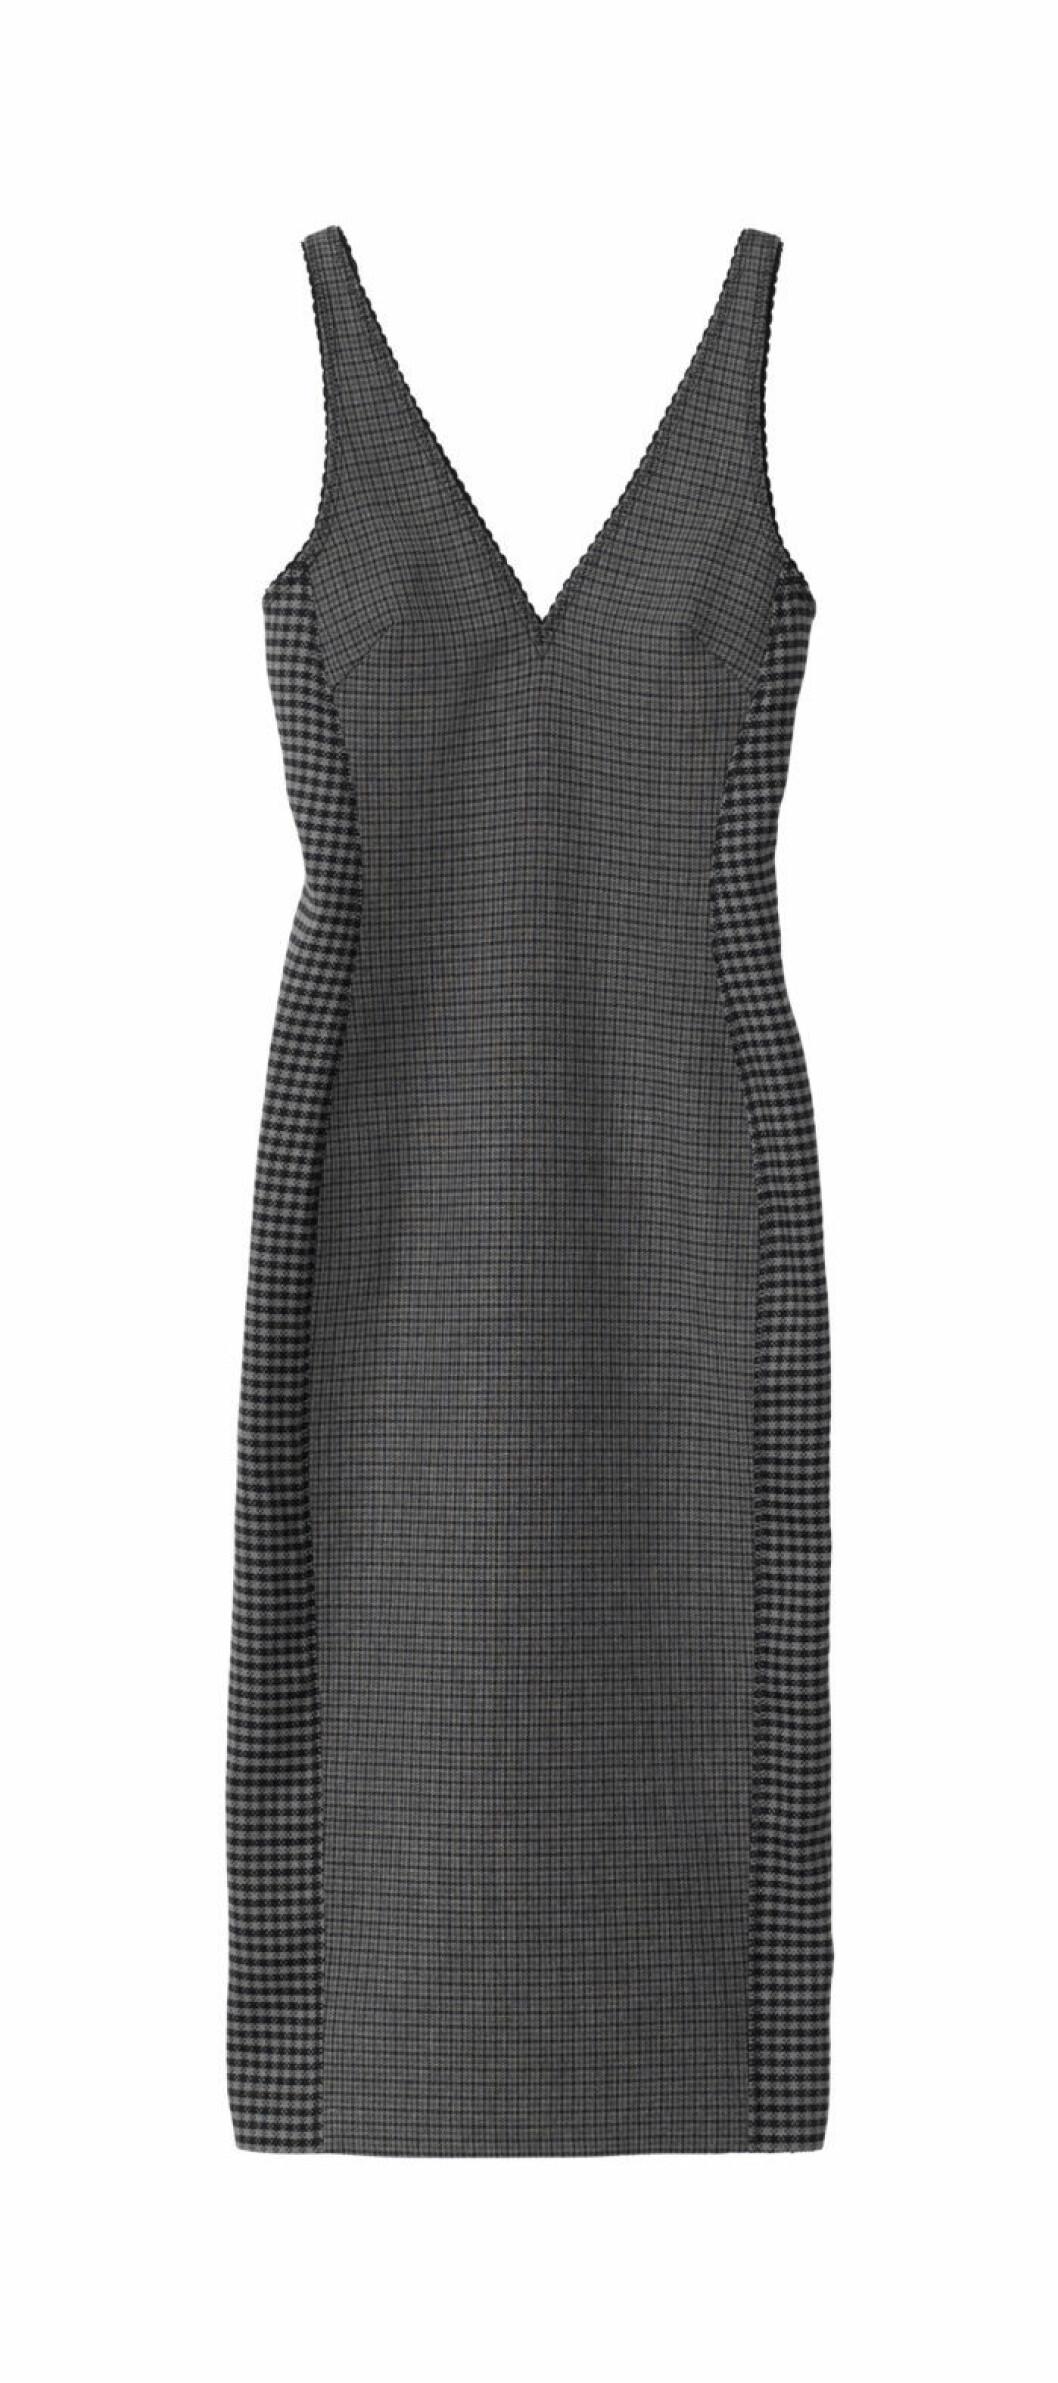 Rutig klänning H&M Studio AW18